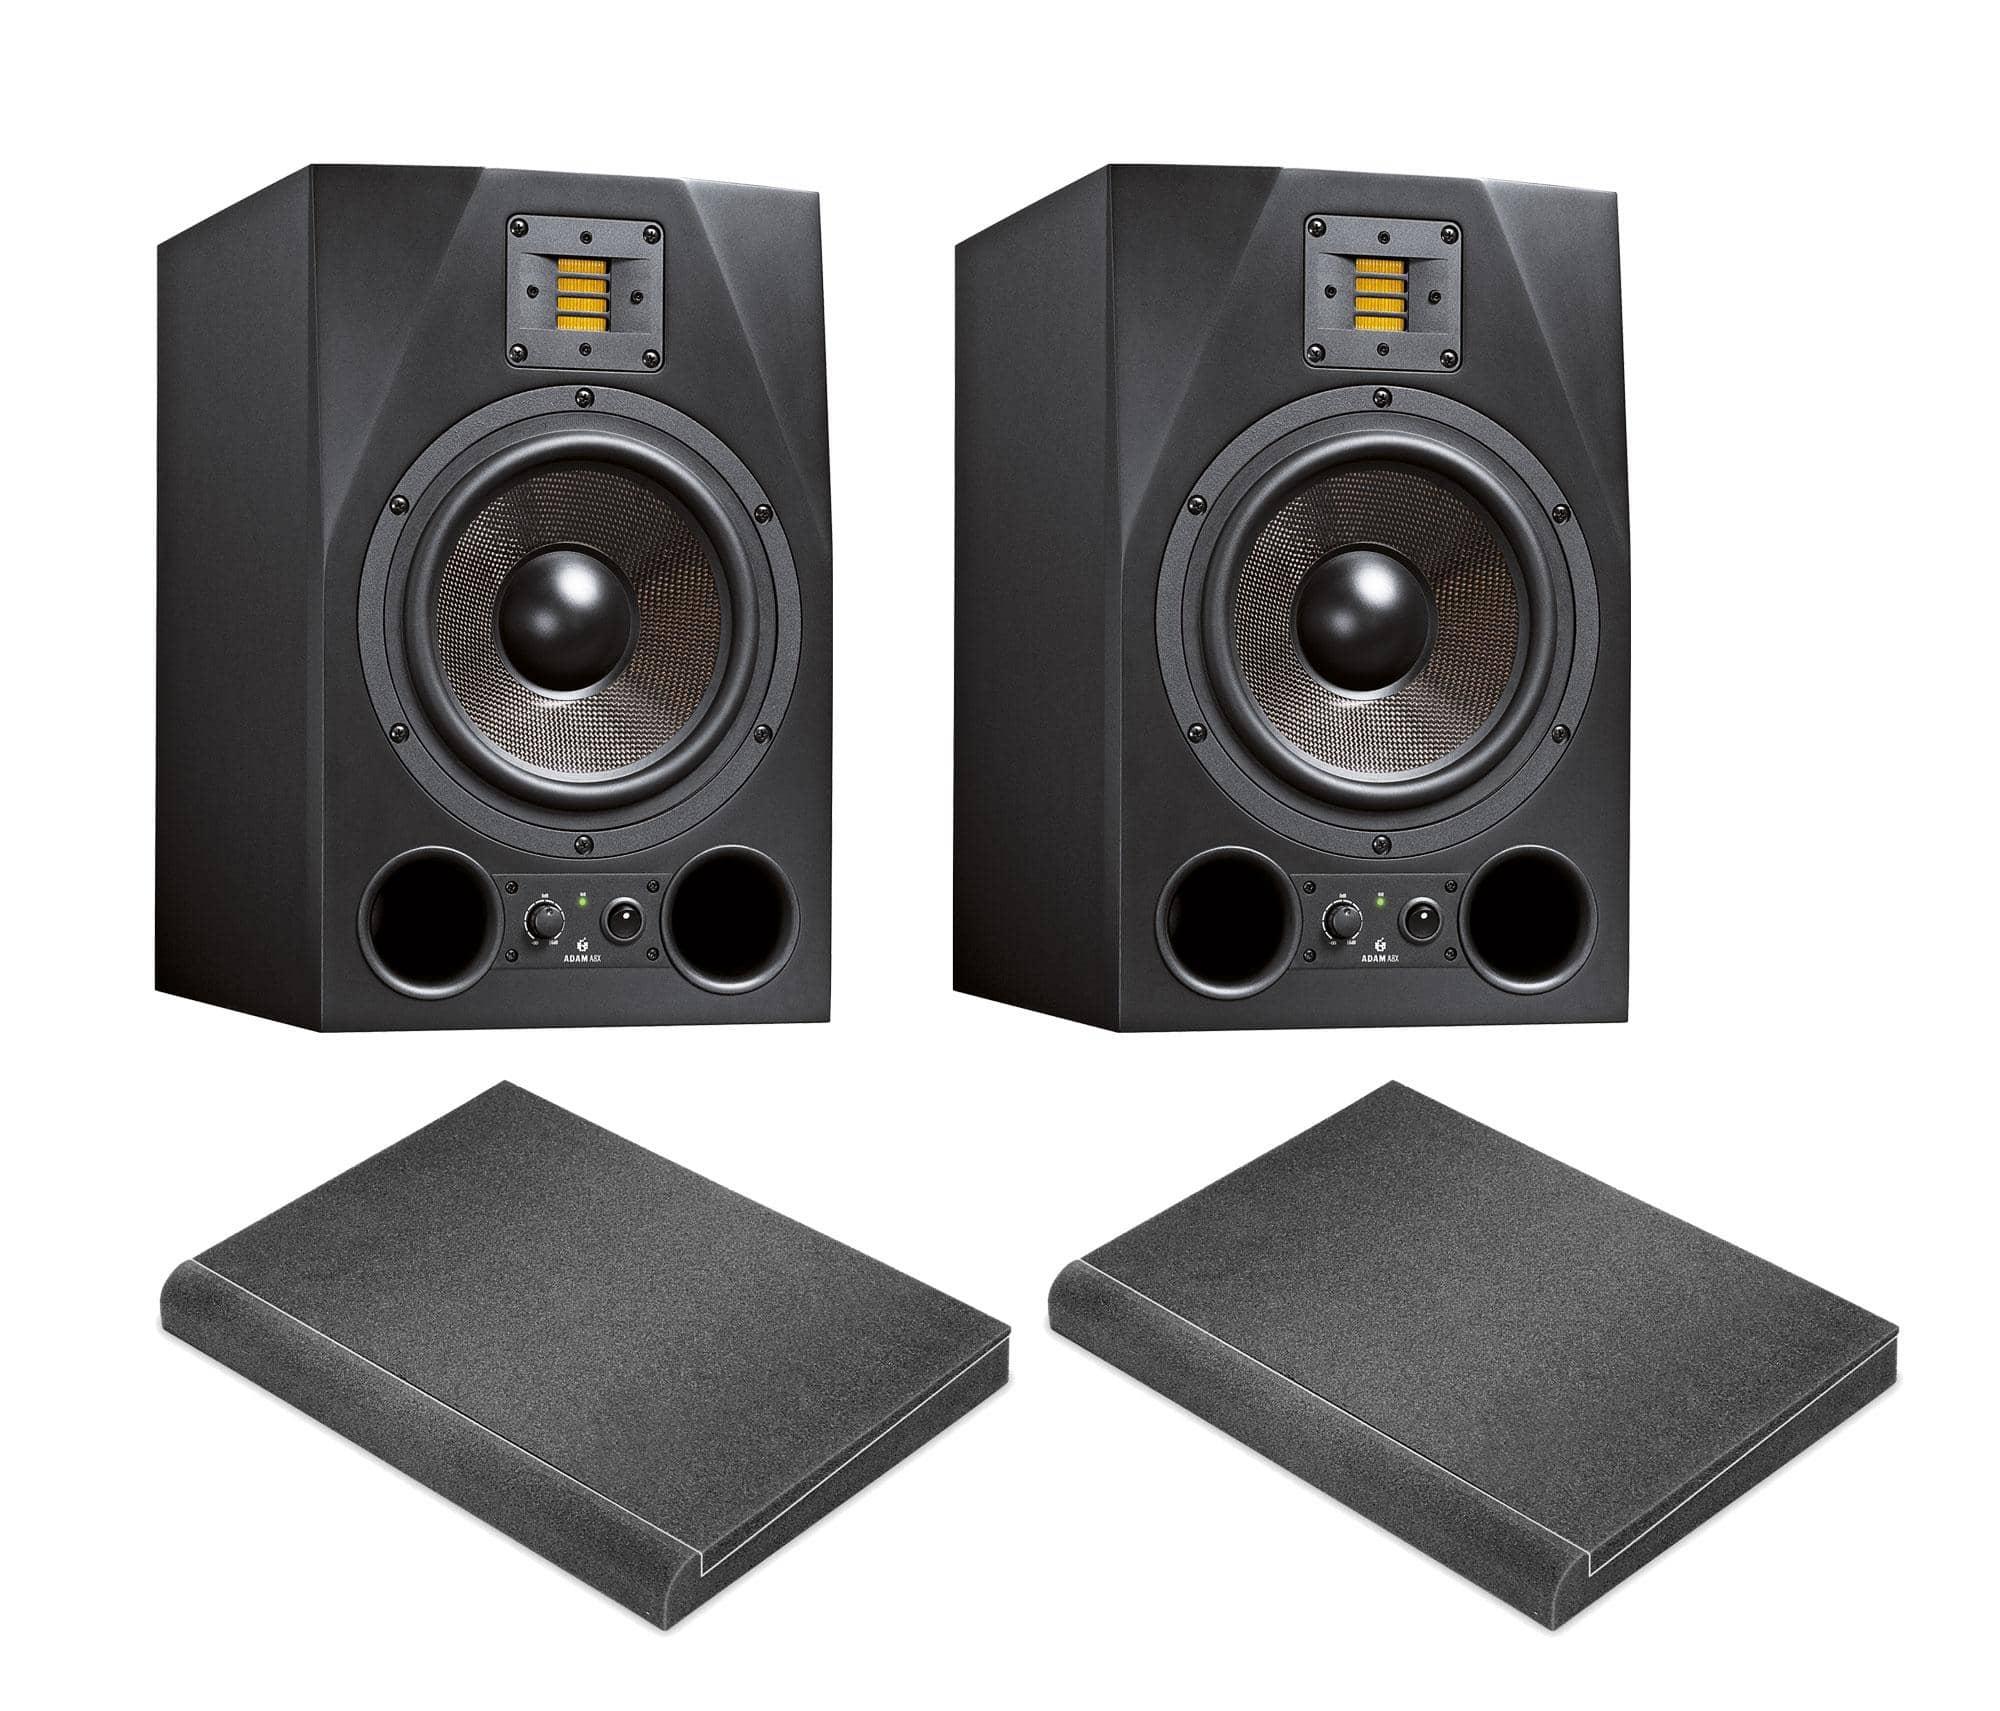 Studiomonitore - Adam Audio A8X ISO Bundle - Onlineshop Musikhaus Kirstein